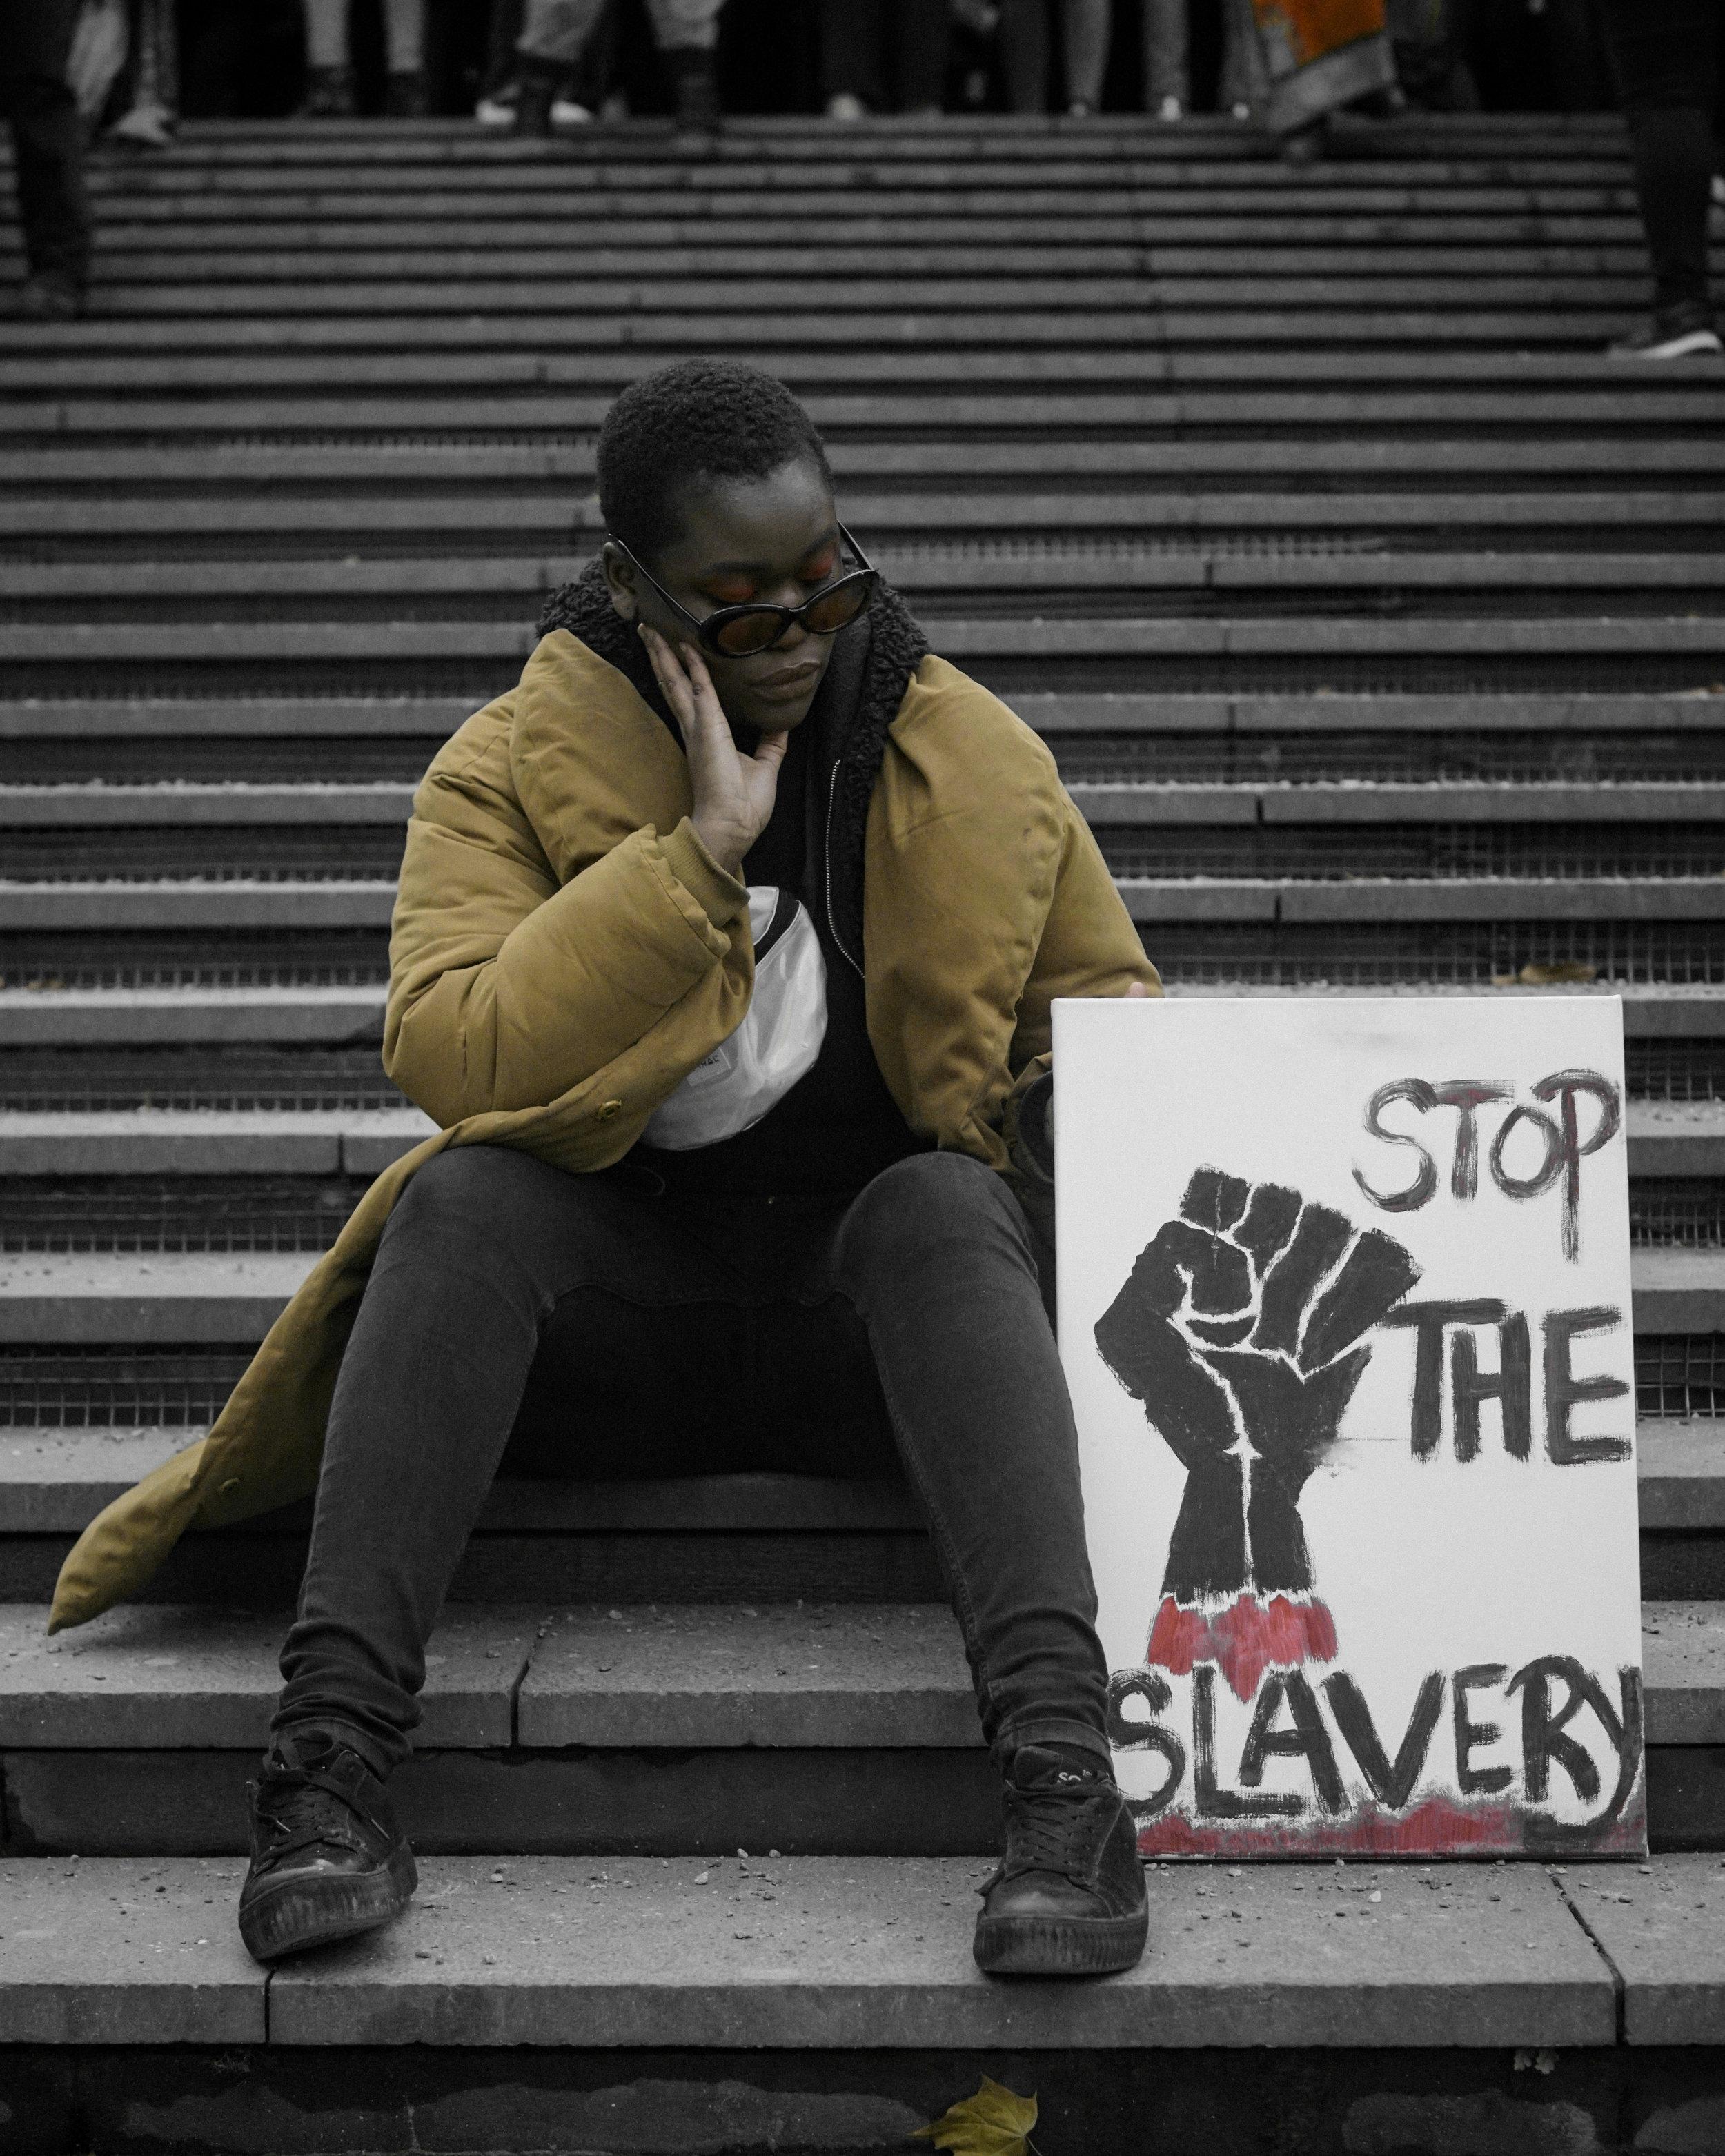 jobe_slaverydemonstration.jpg